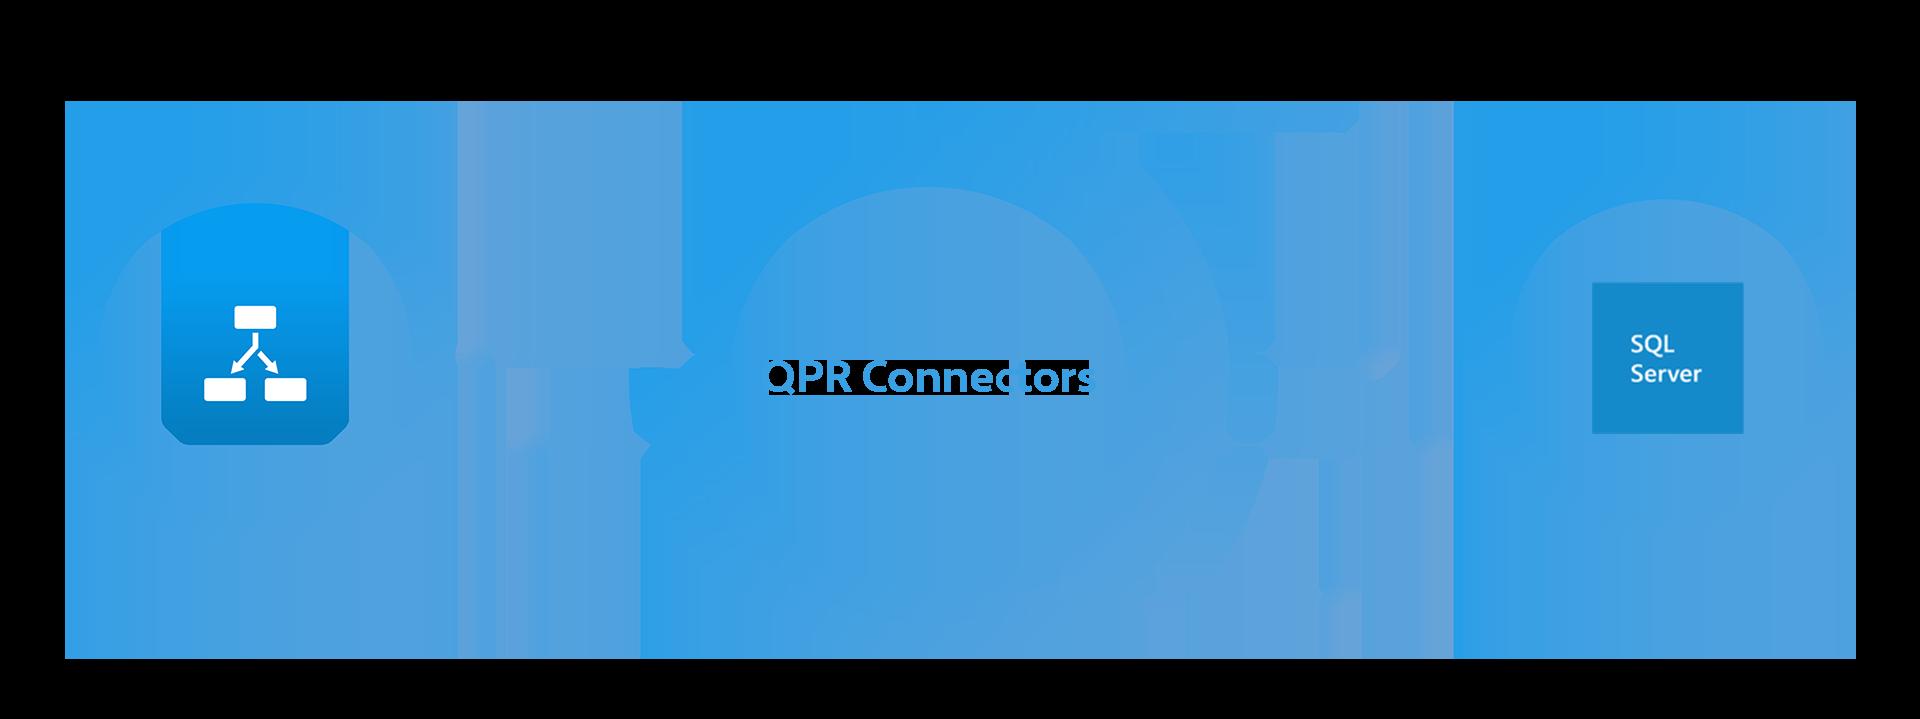 QPR-Connector-Microsoft-SQL-Server+Process-Mining